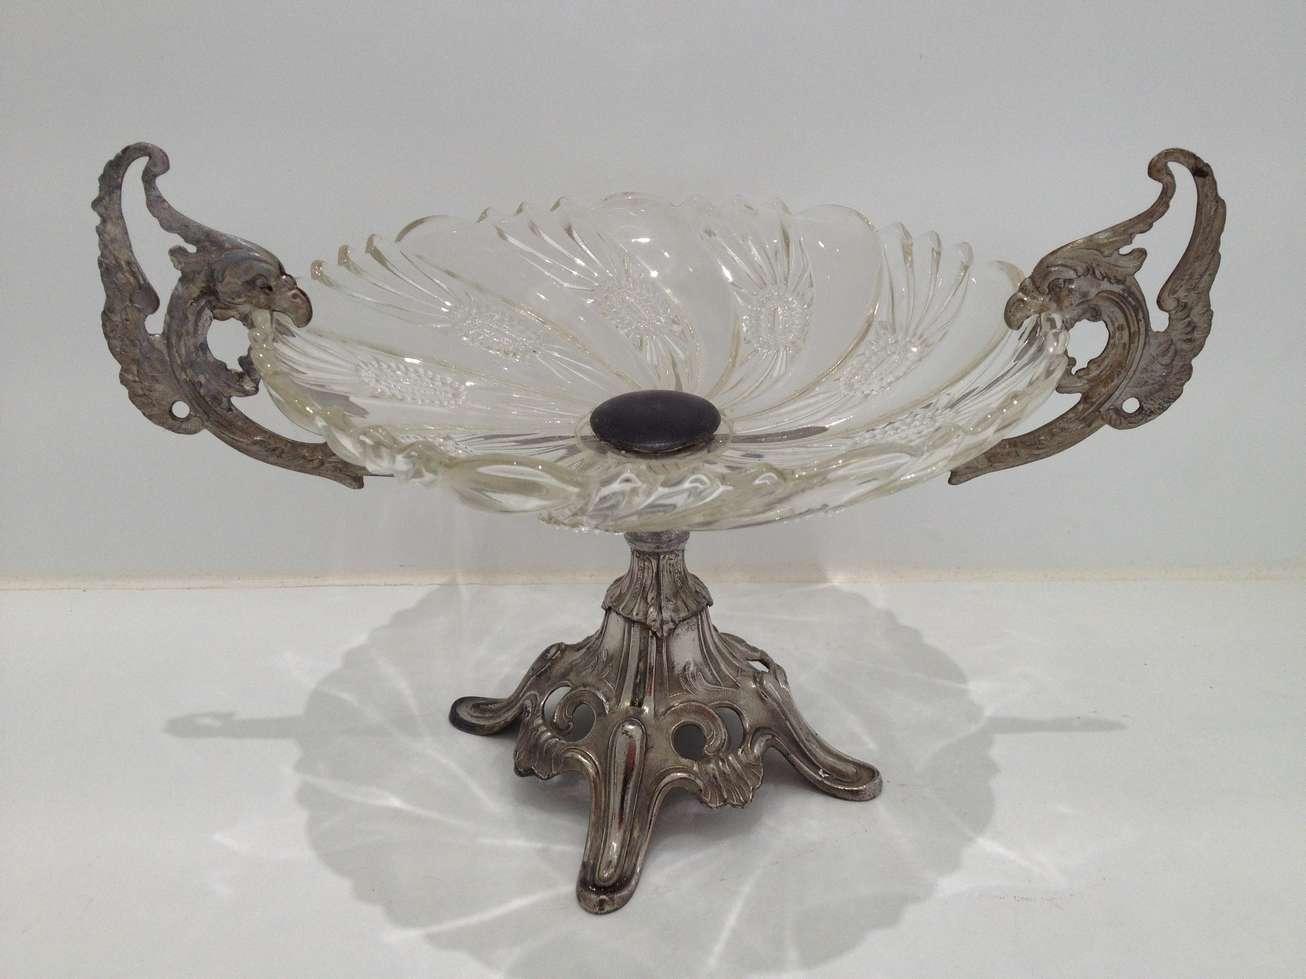 coupe-regule-metal-restauration-art-restaurarte-bronze-restauration.jpg